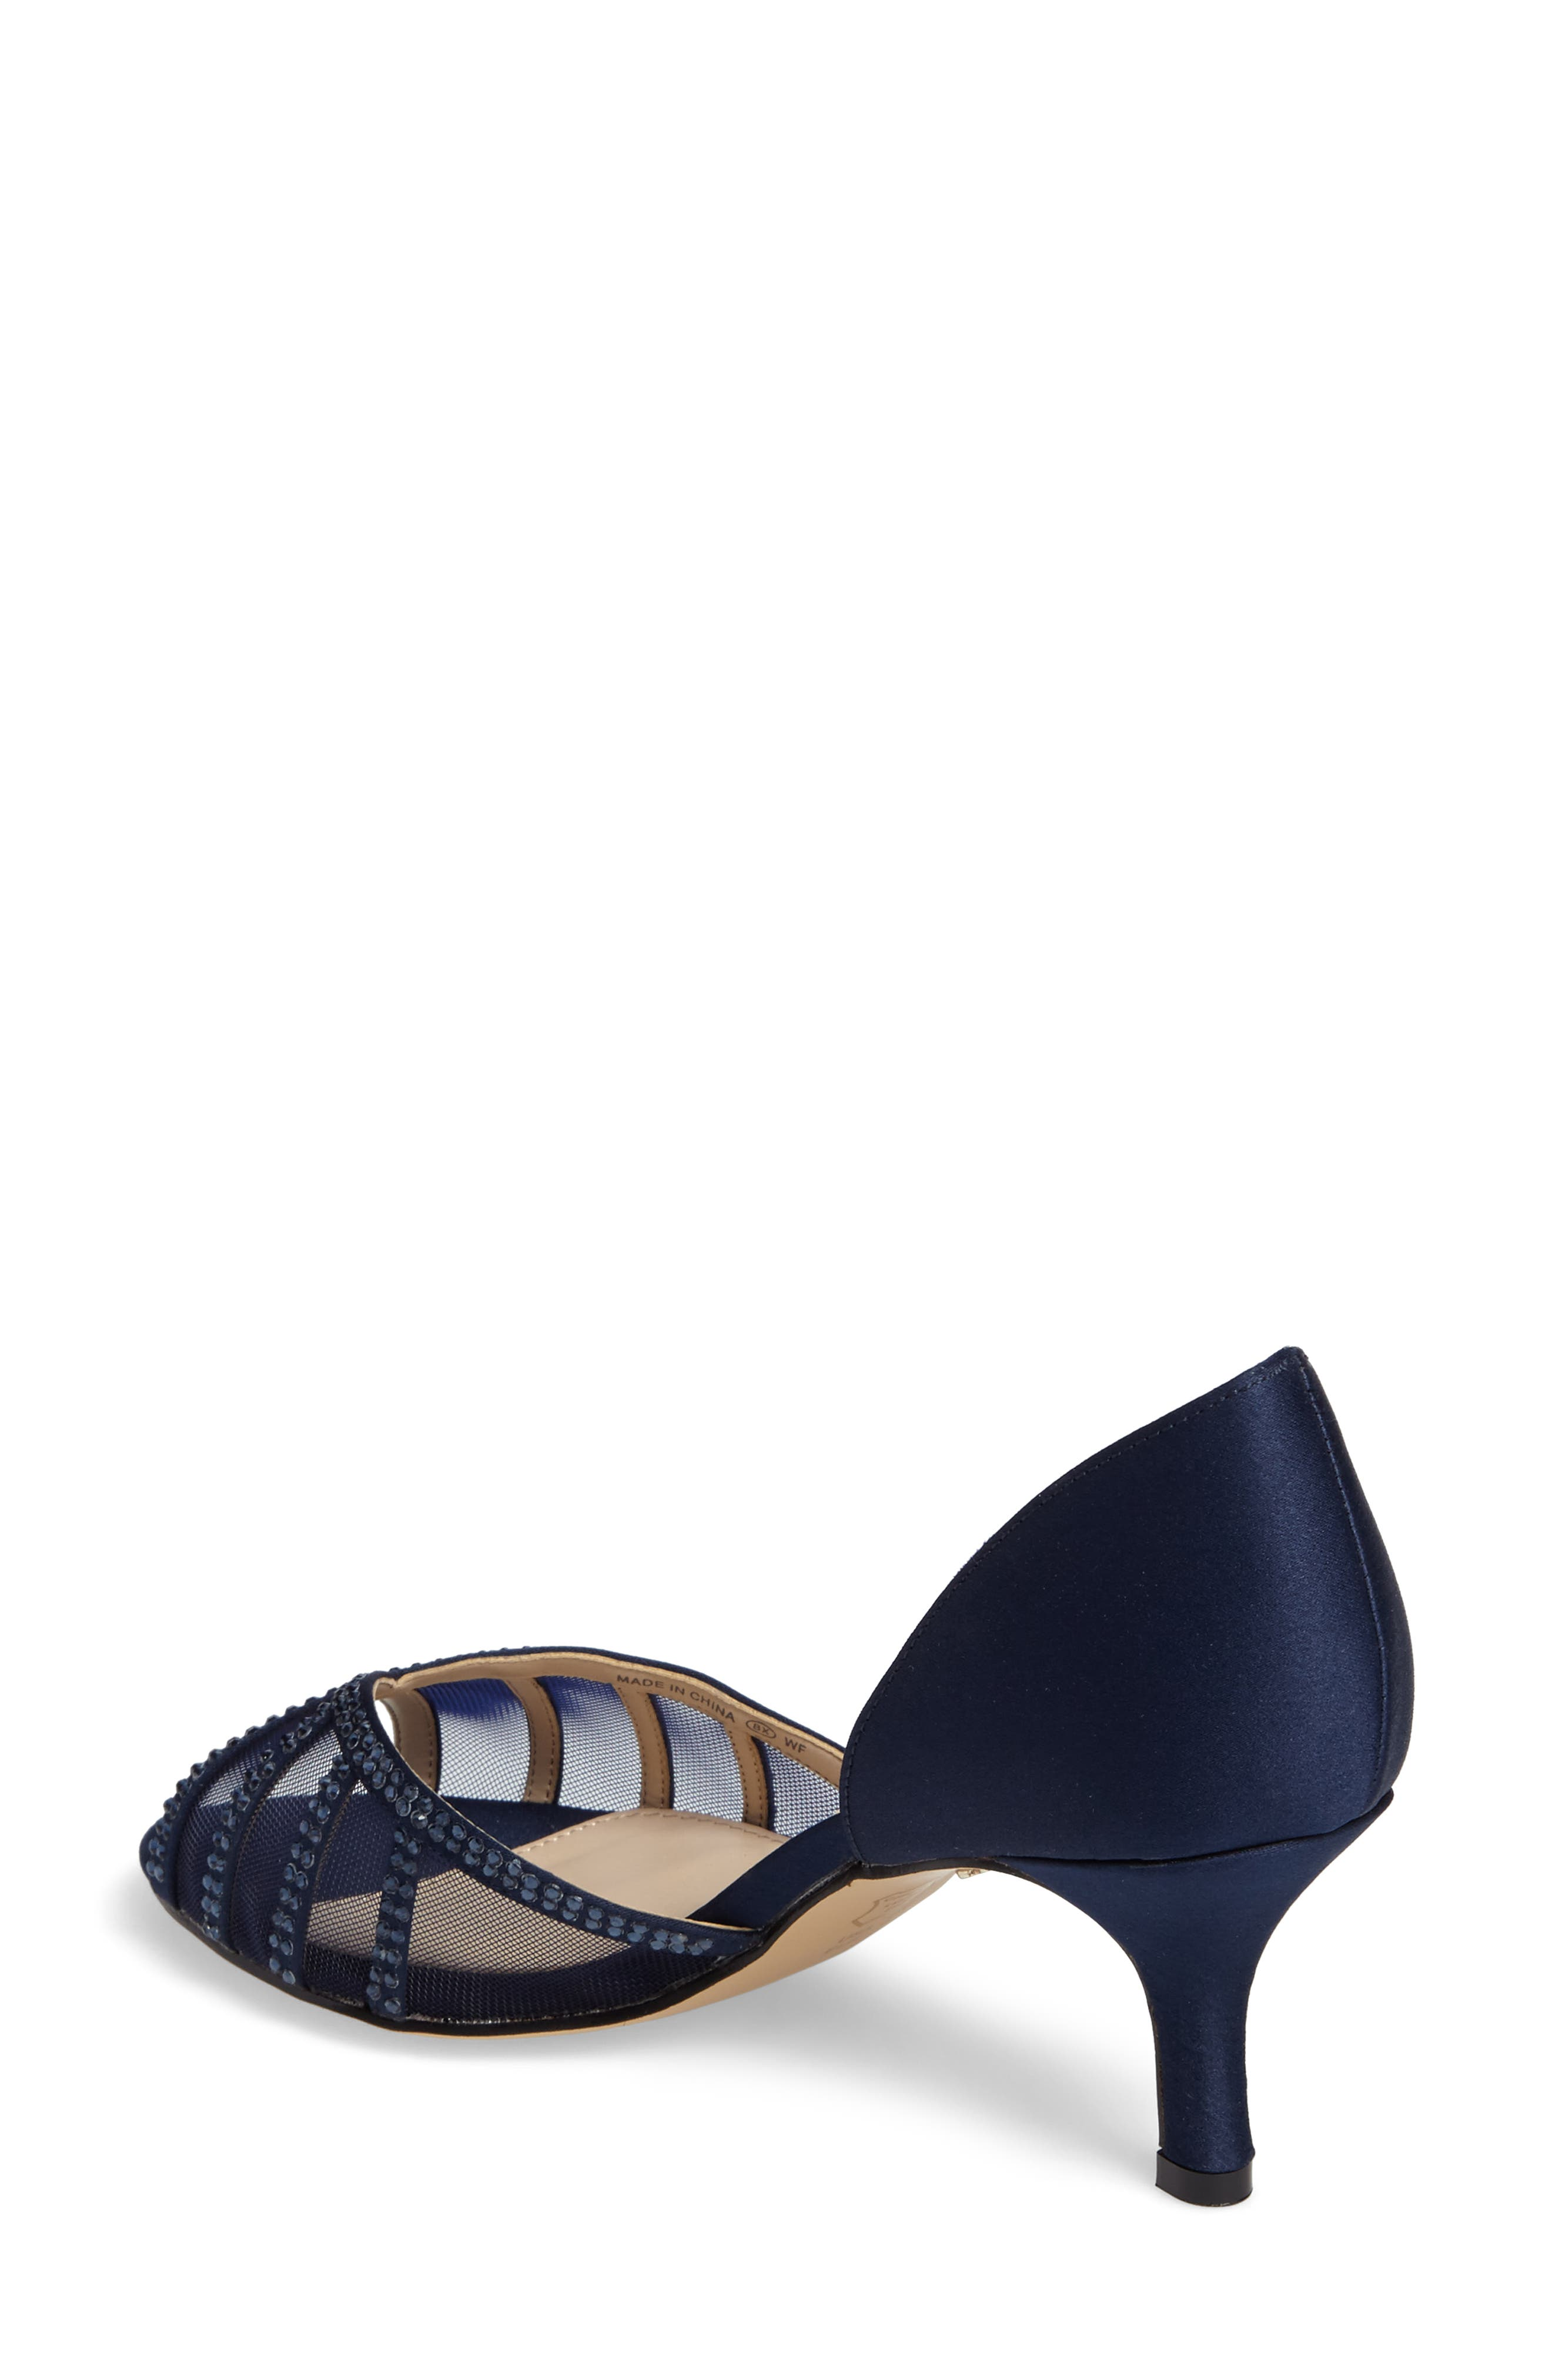 Corita Embellished Mesh Sandal,                             Alternate thumbnail 2, color,                             Blue Satin